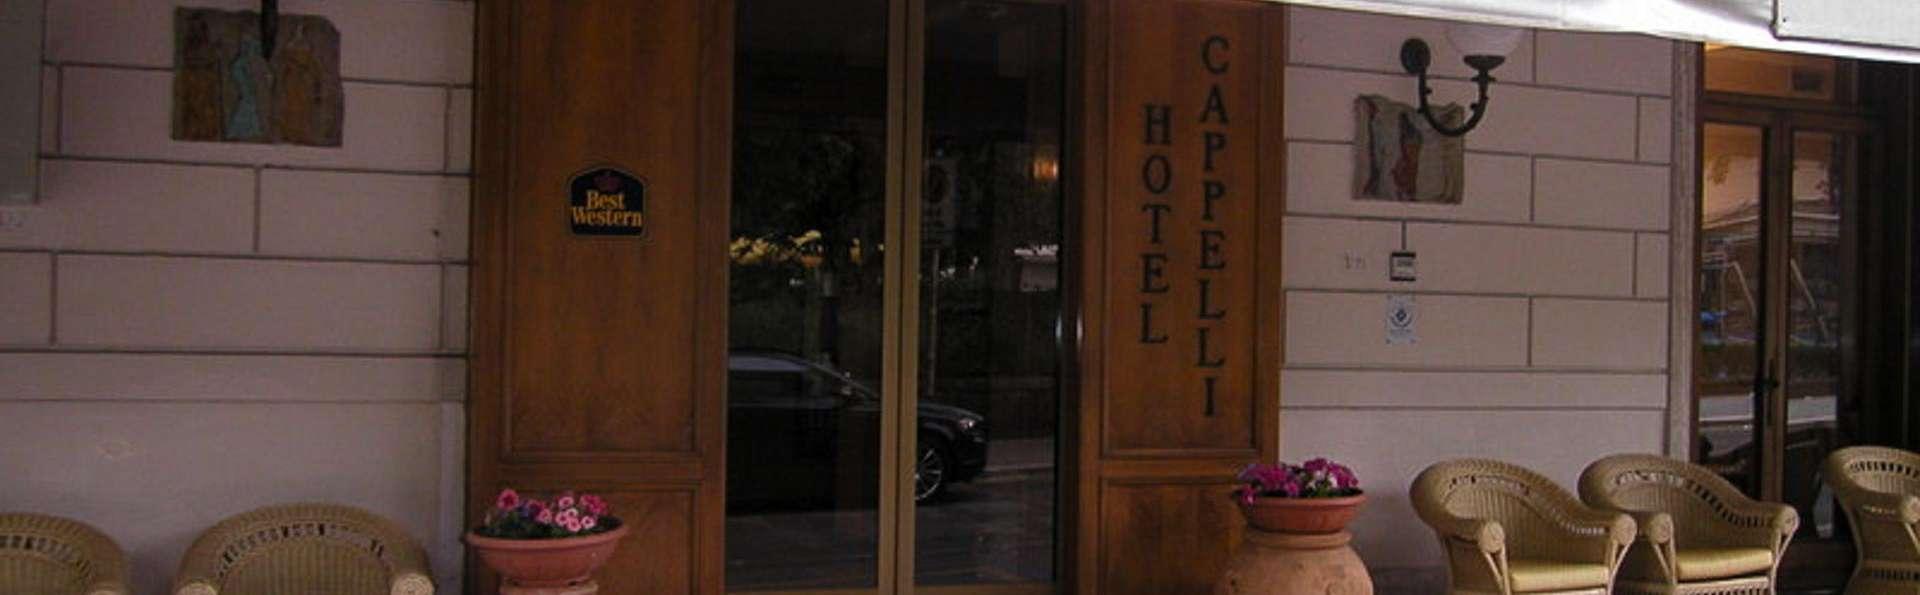 HG Hotel Cappelli - EDIT_FRONT_01.jpg